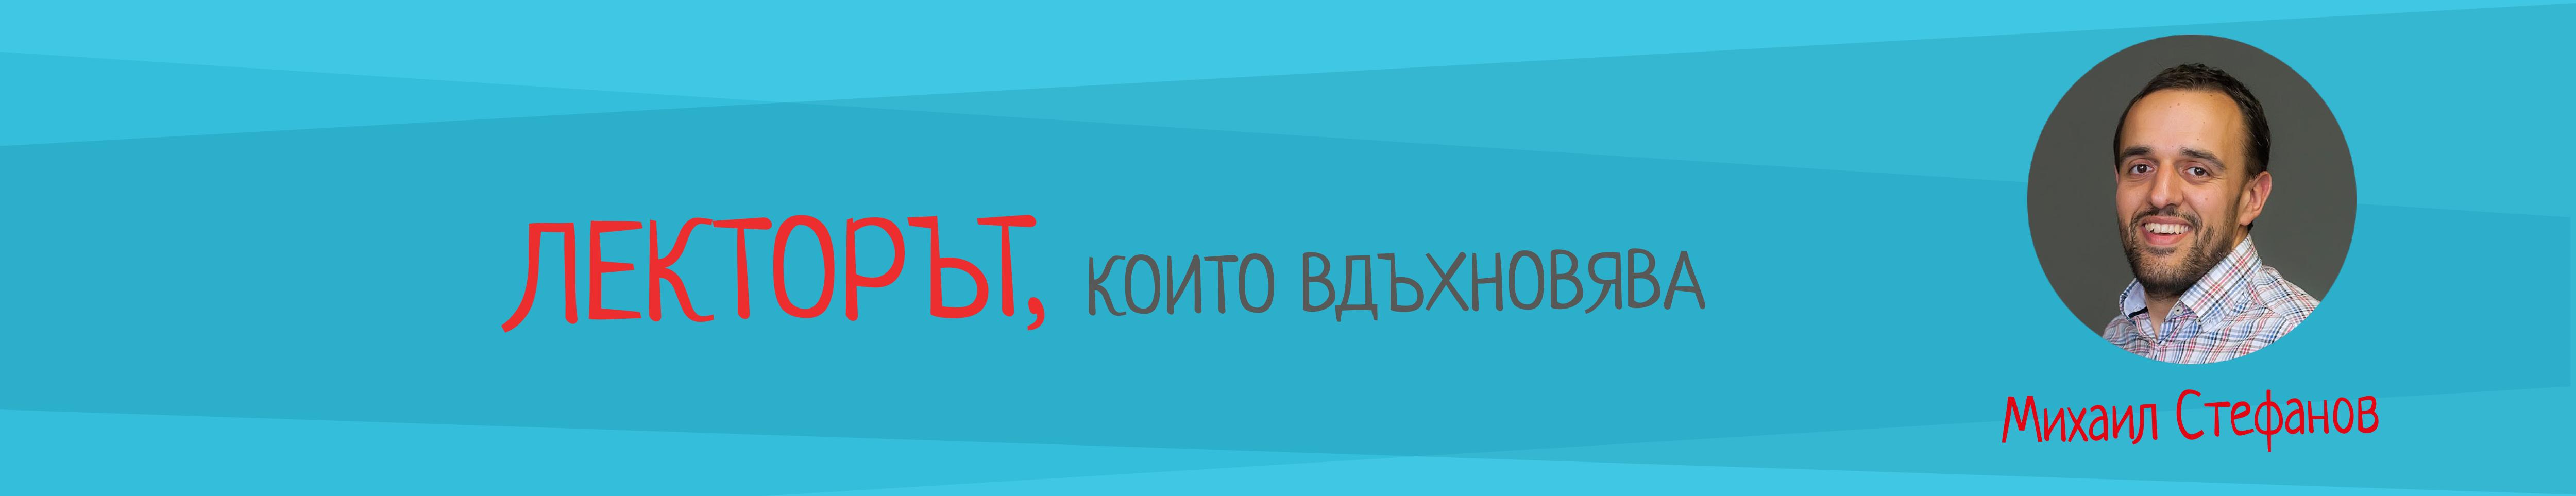 event_website_1